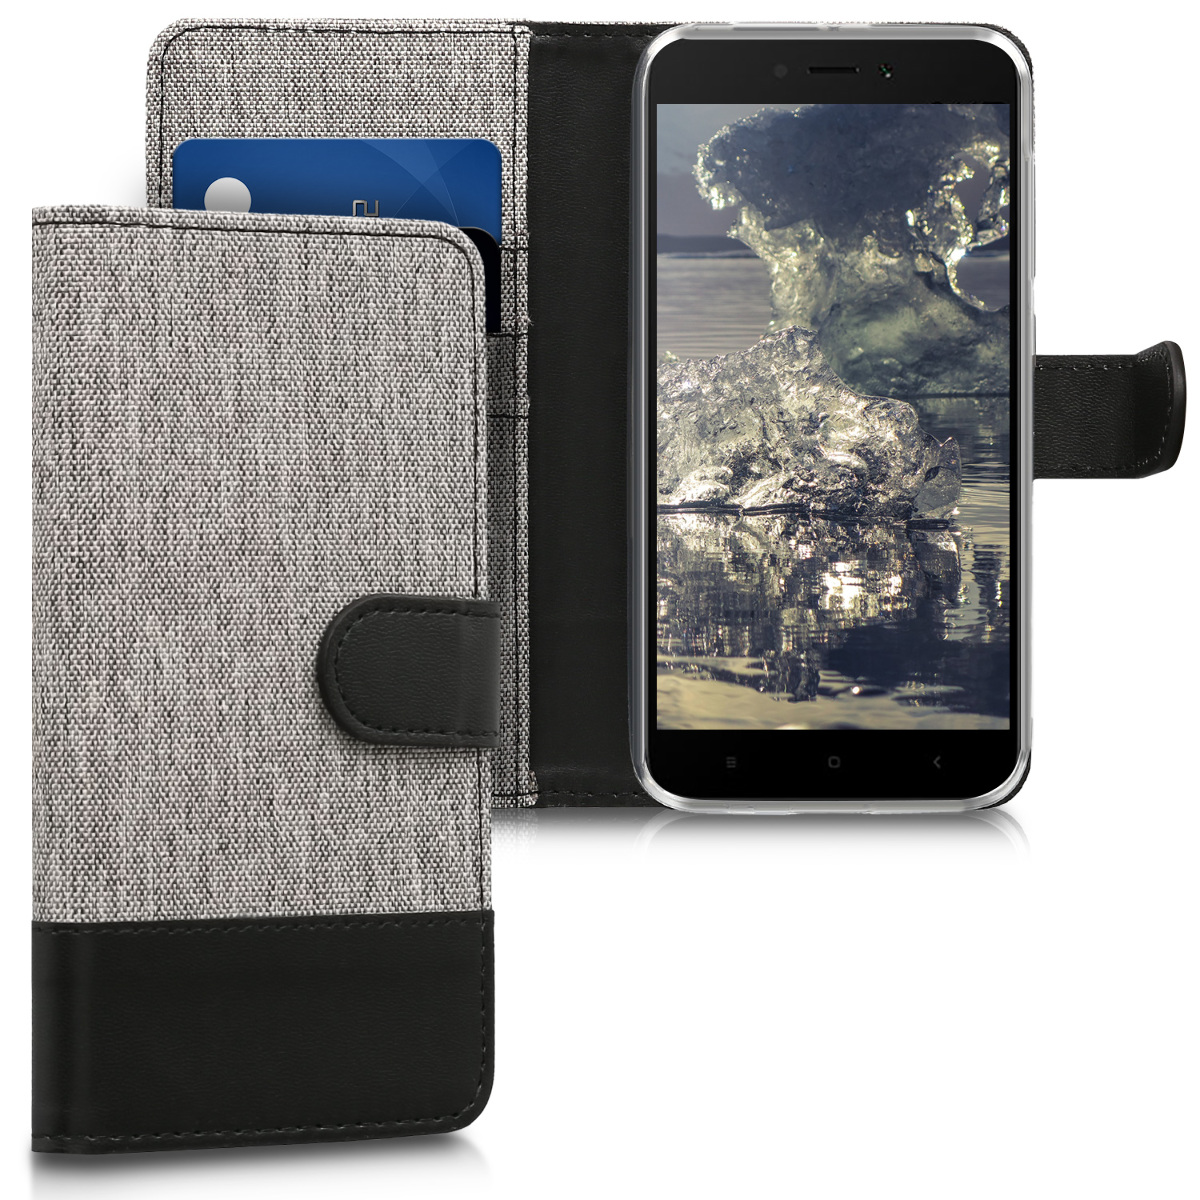 Textilní látkové pouzdro | obal pro Xiaomi Redmi 5A - Šedá / černý